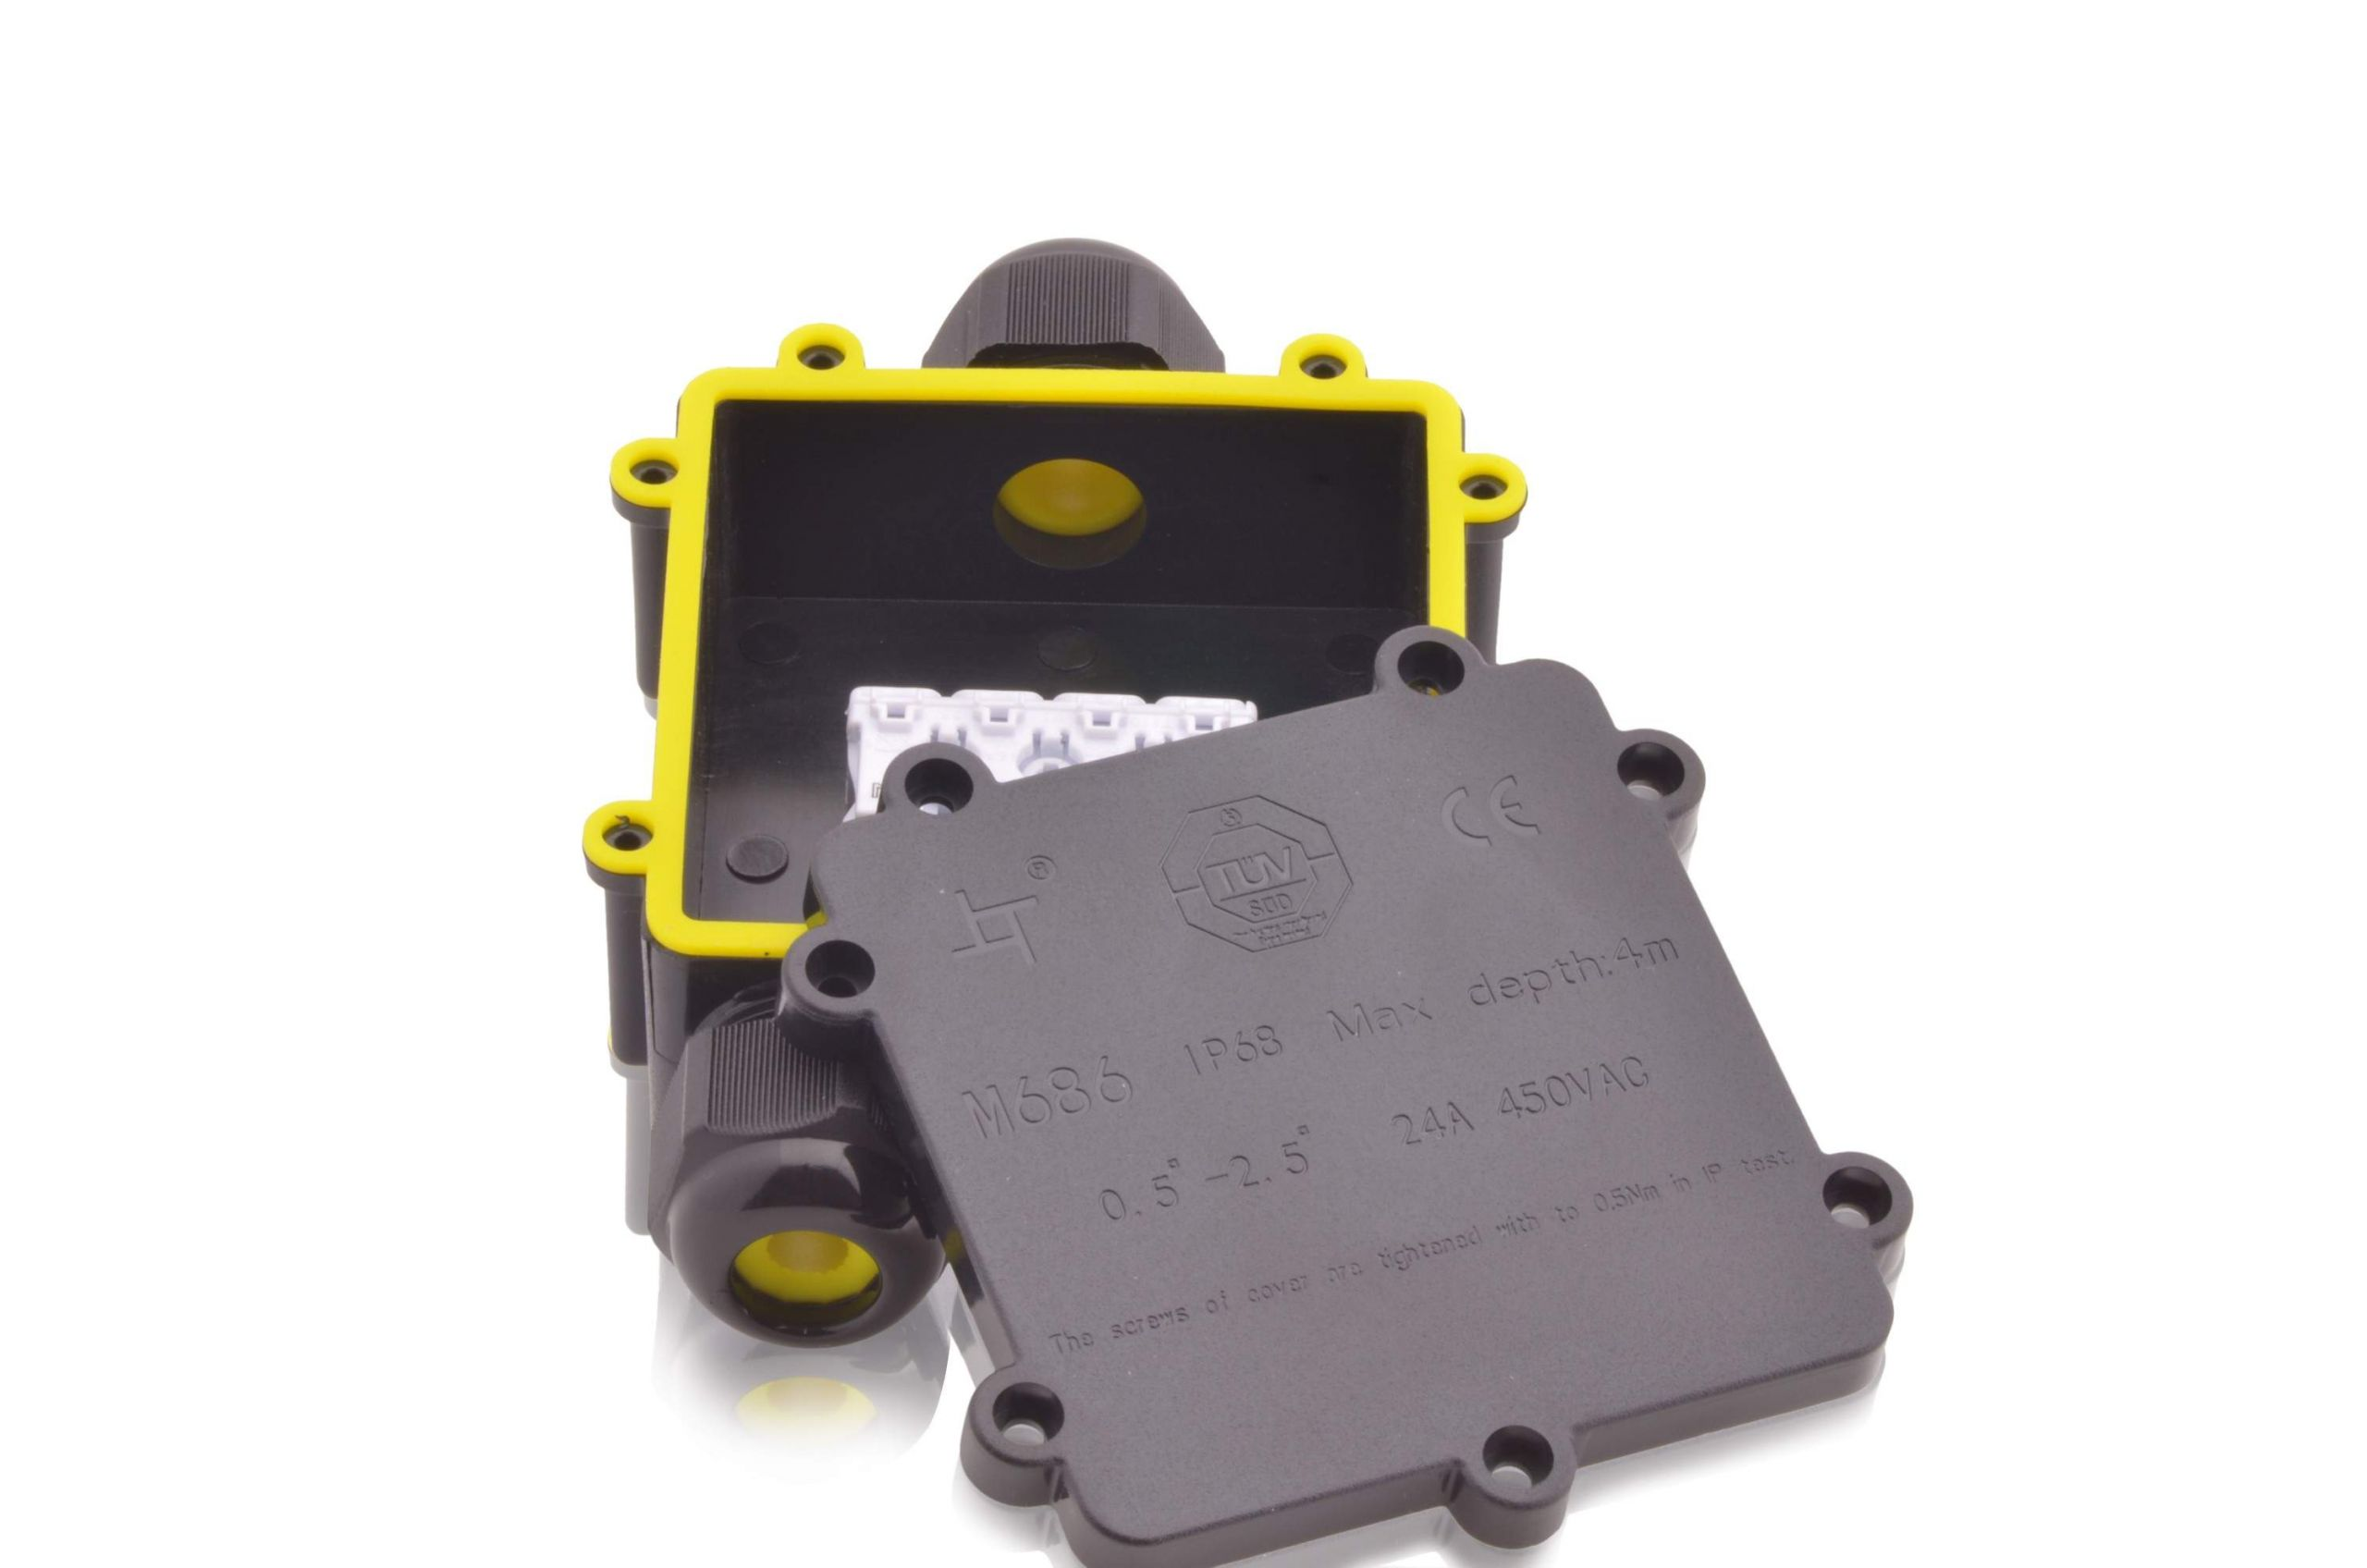 Intratec Geh use Serie Wasserdicht IP68 JSGH687 1 1 JPG